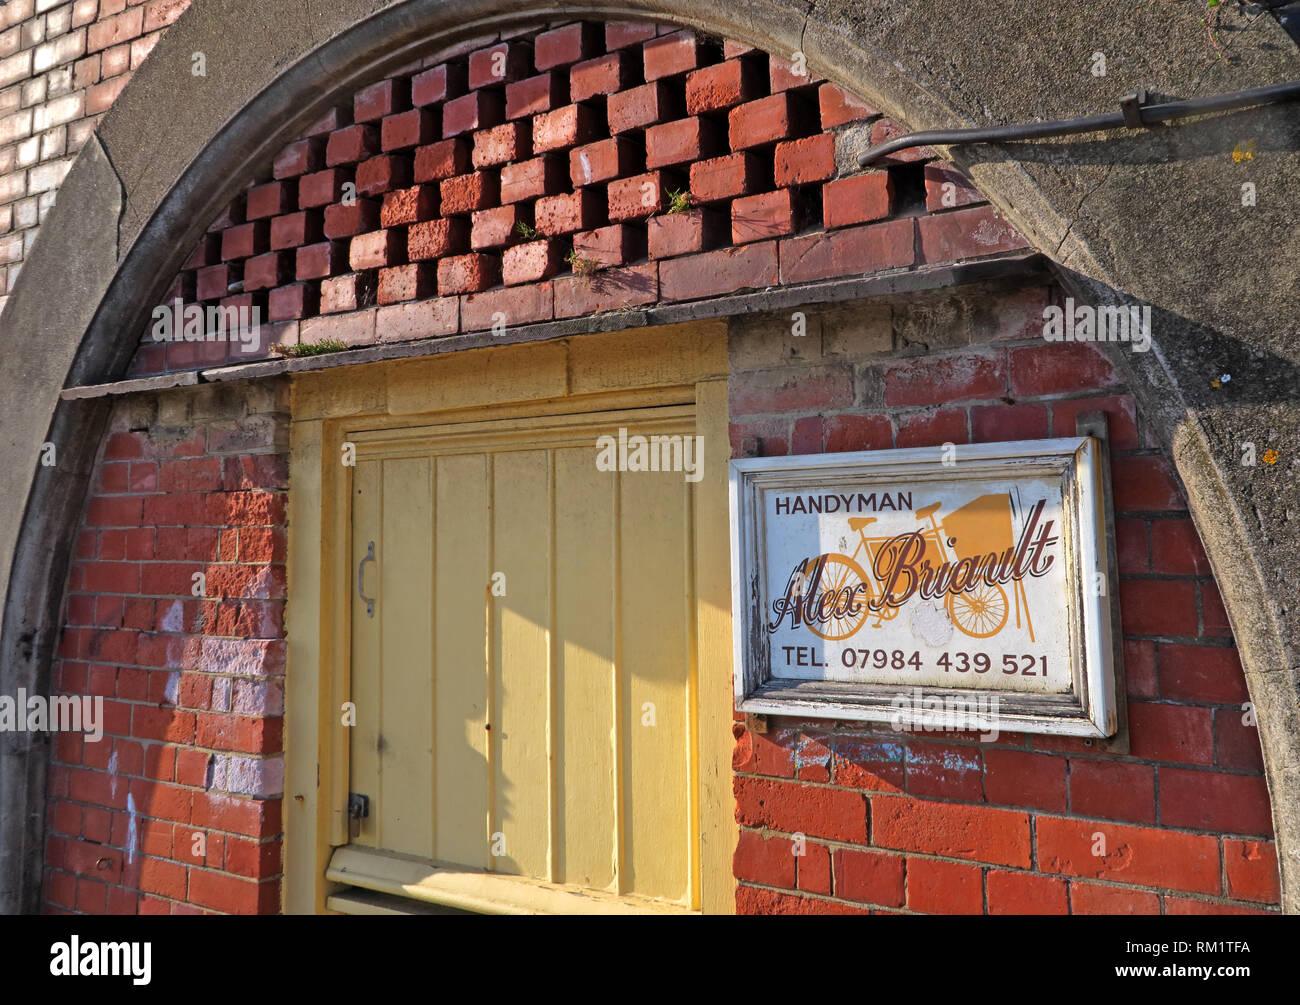 GoTonySmith,HotpixUK,@HotpixUK,England,UK,city centre,West Sussex,City Centre,red brick,brick,red,Handyman Alex Briault 07984-4395211,beachfront arches,Brighton,East Sussex,South East England,Handyman,Alex Briault,07984-4395211,beachfront,arches,Brighton East Sussex,079844395211,beach front,arch,South,East,handy man,Kings Road Arches Brighton,Kings Road Arches,English Seaside,British seaside